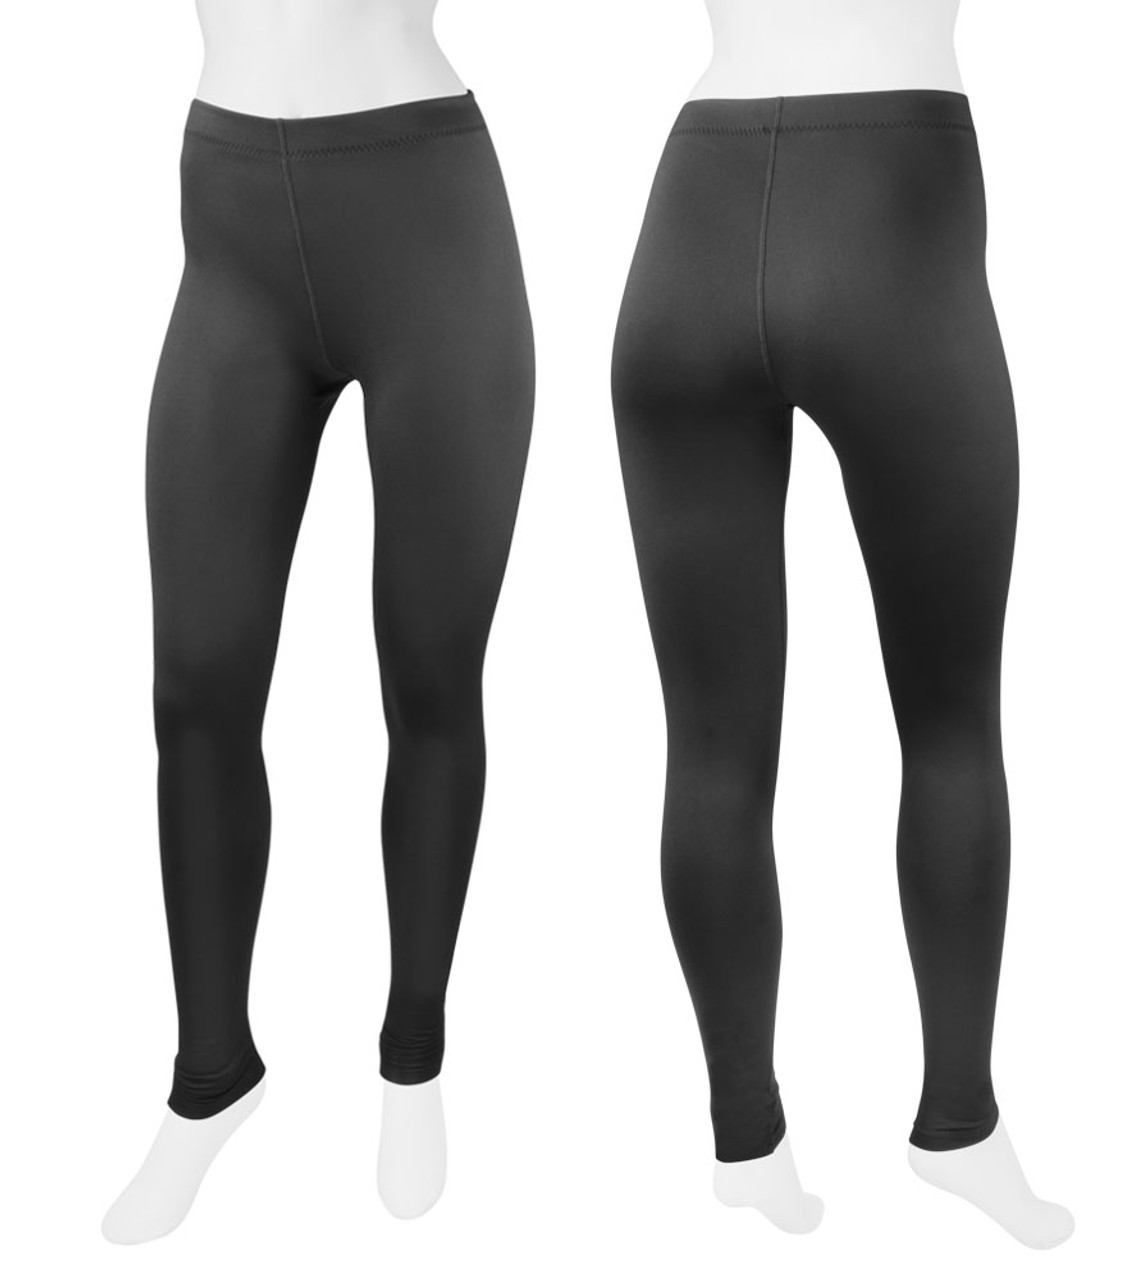 Aero Tech Women's Spandex Tights Stretch Workout Leggings UNPADDED